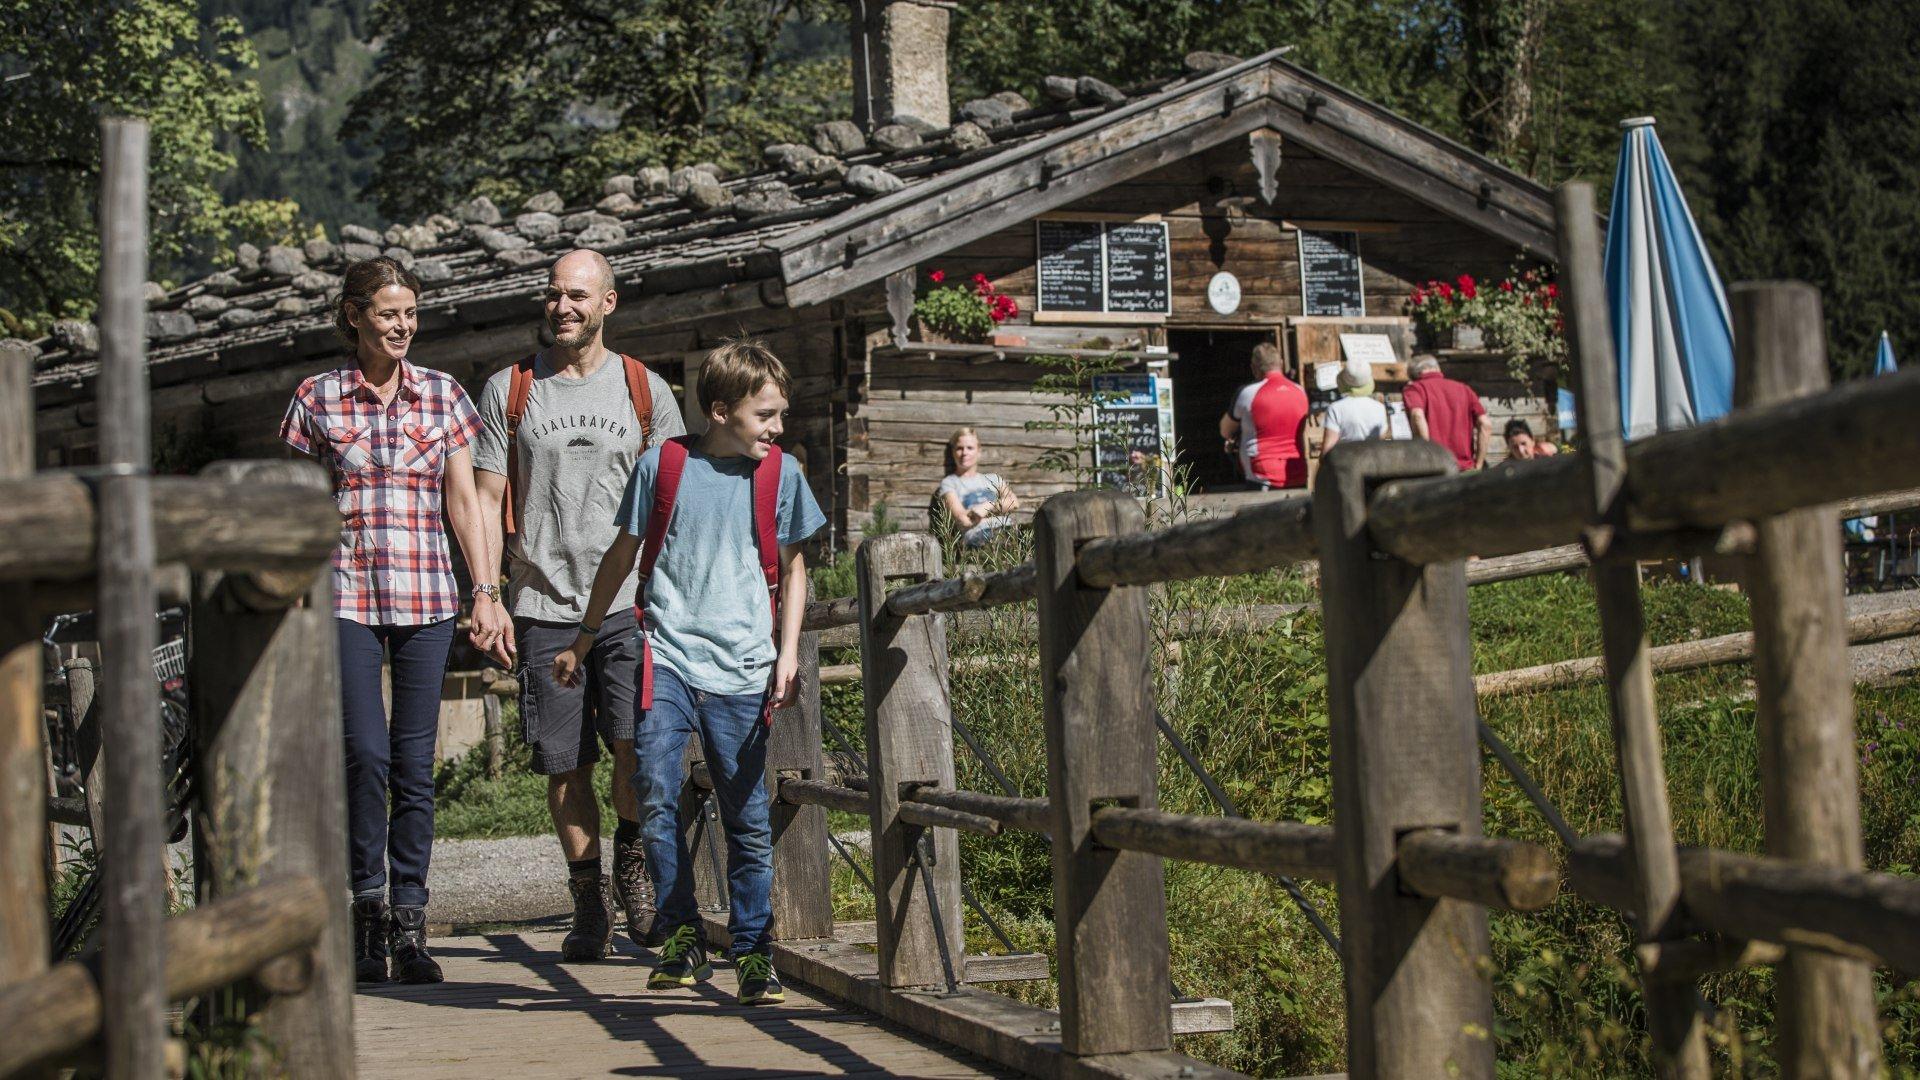 Familienwandern - Feuer & Eis Touristik , © Hansi Heckmair